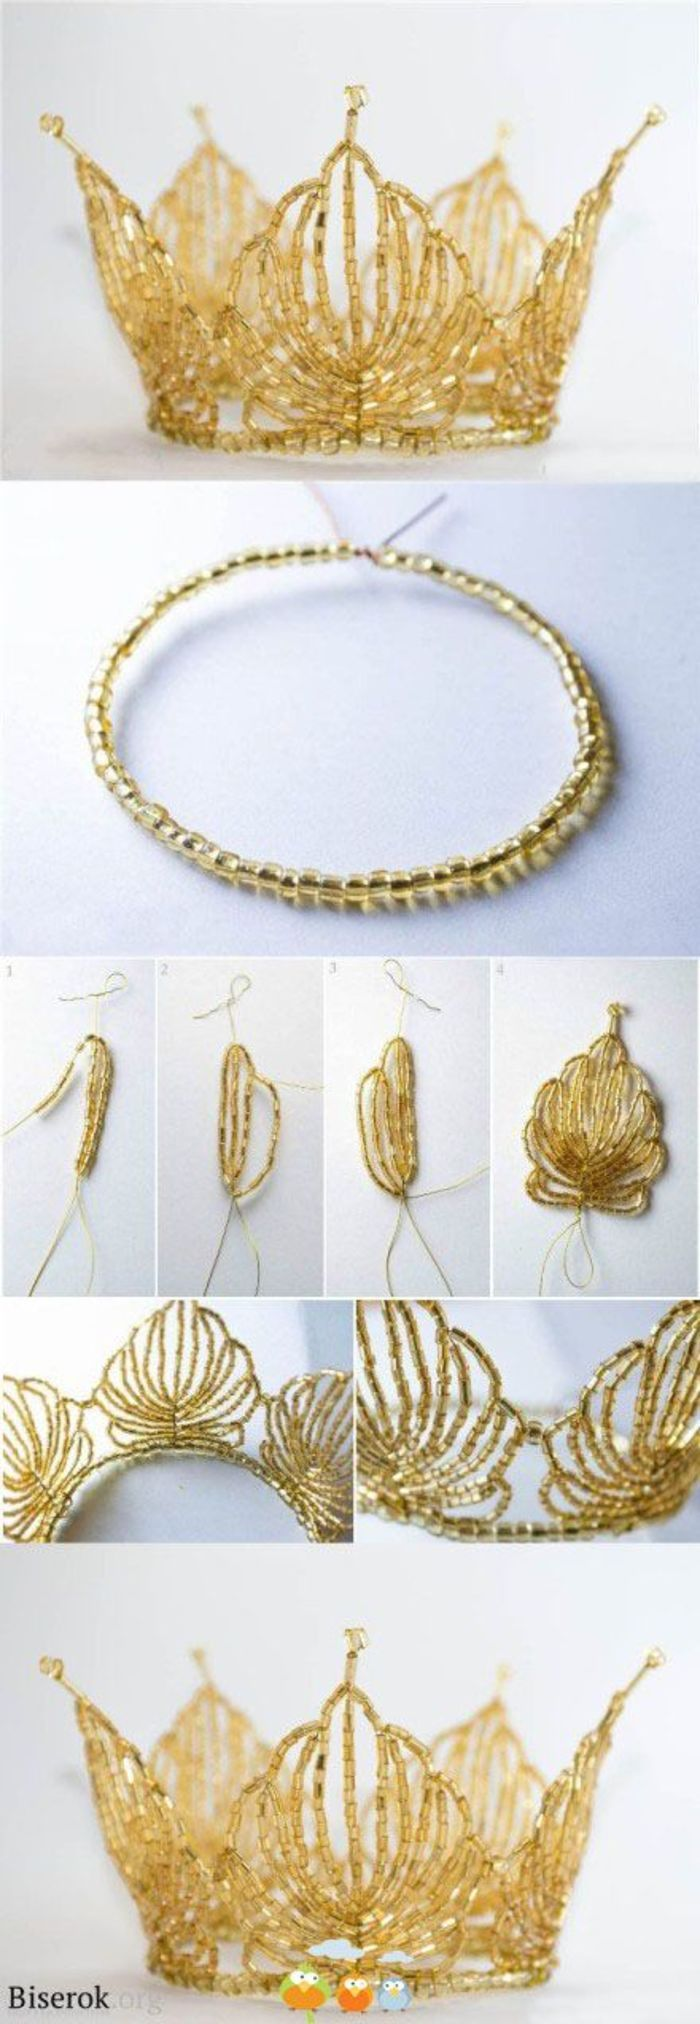 best accessories images on pinterest diy bracelet jewelry